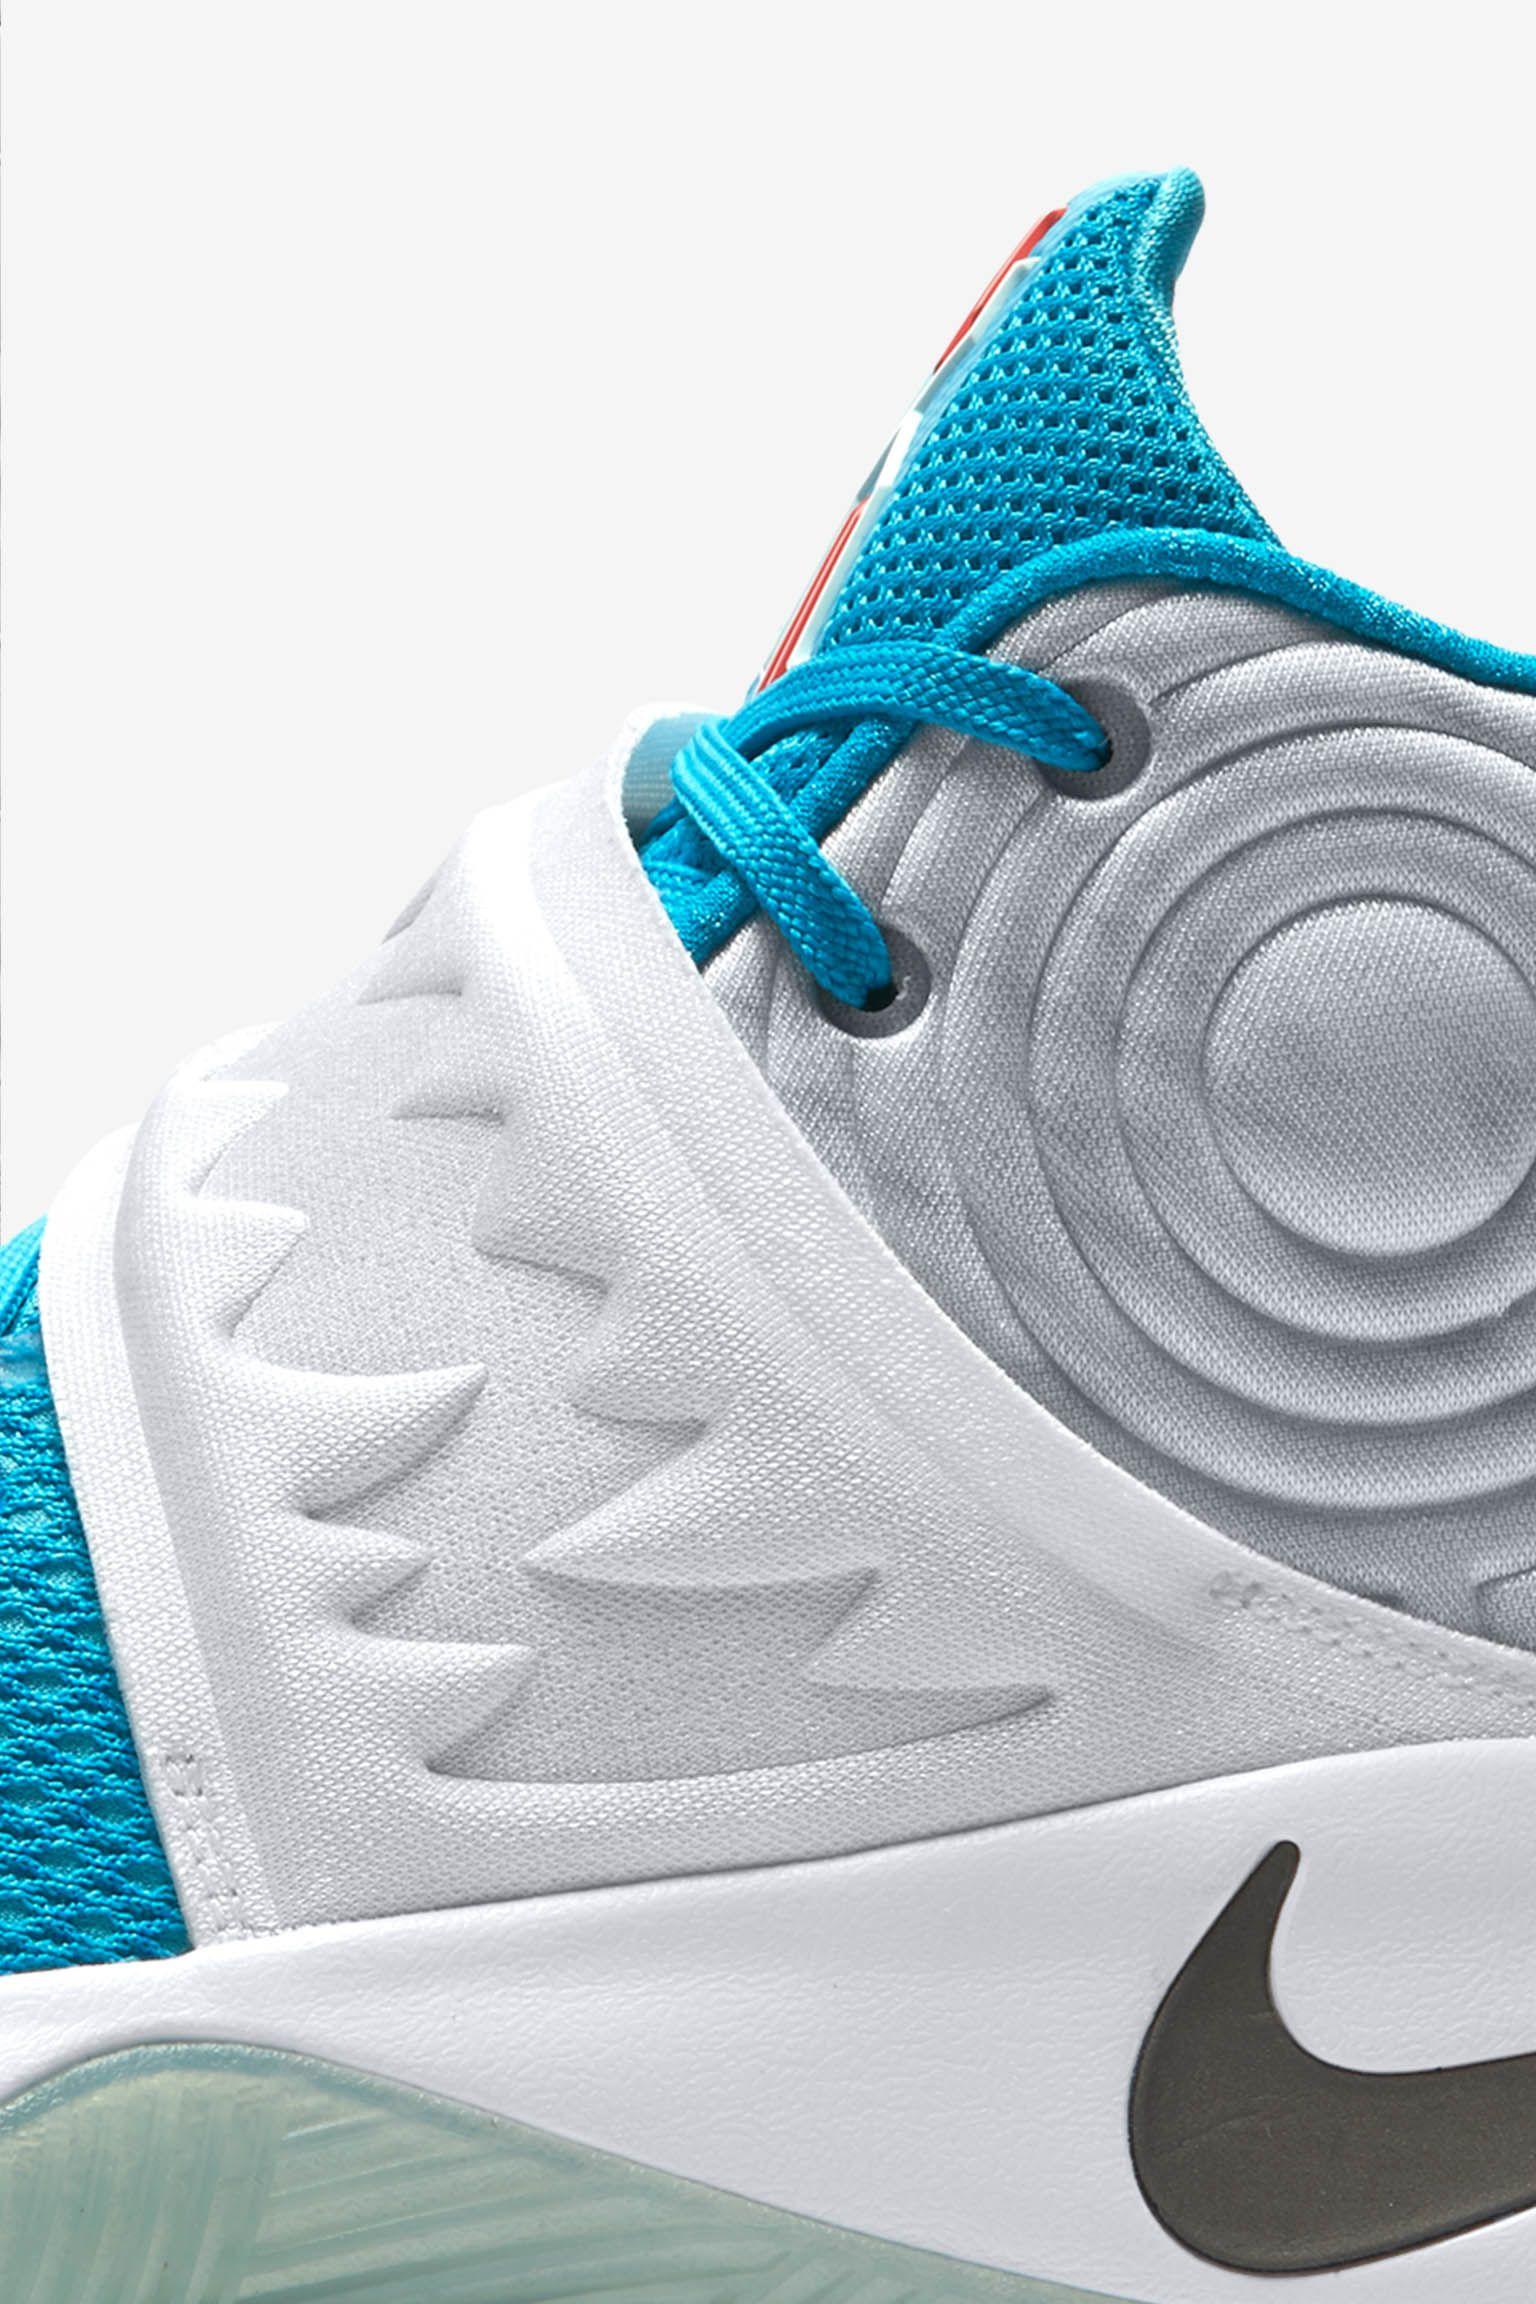 Nike Kyrie 2 'Fire & Ice' Release Date